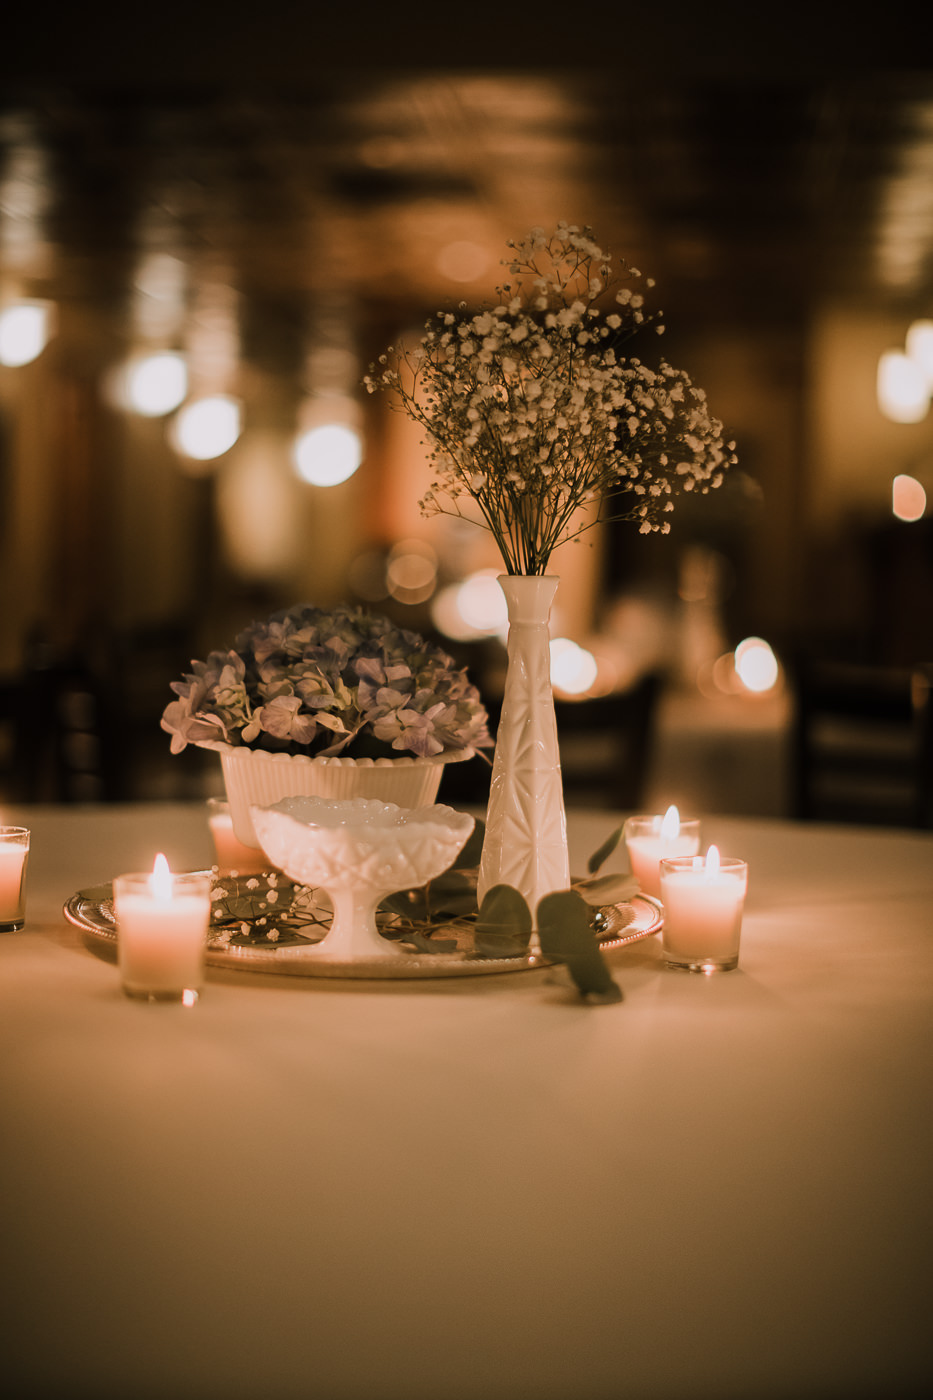 rogers.arkansas.weddingphotos.©2018mileswittboyer-31.jpg